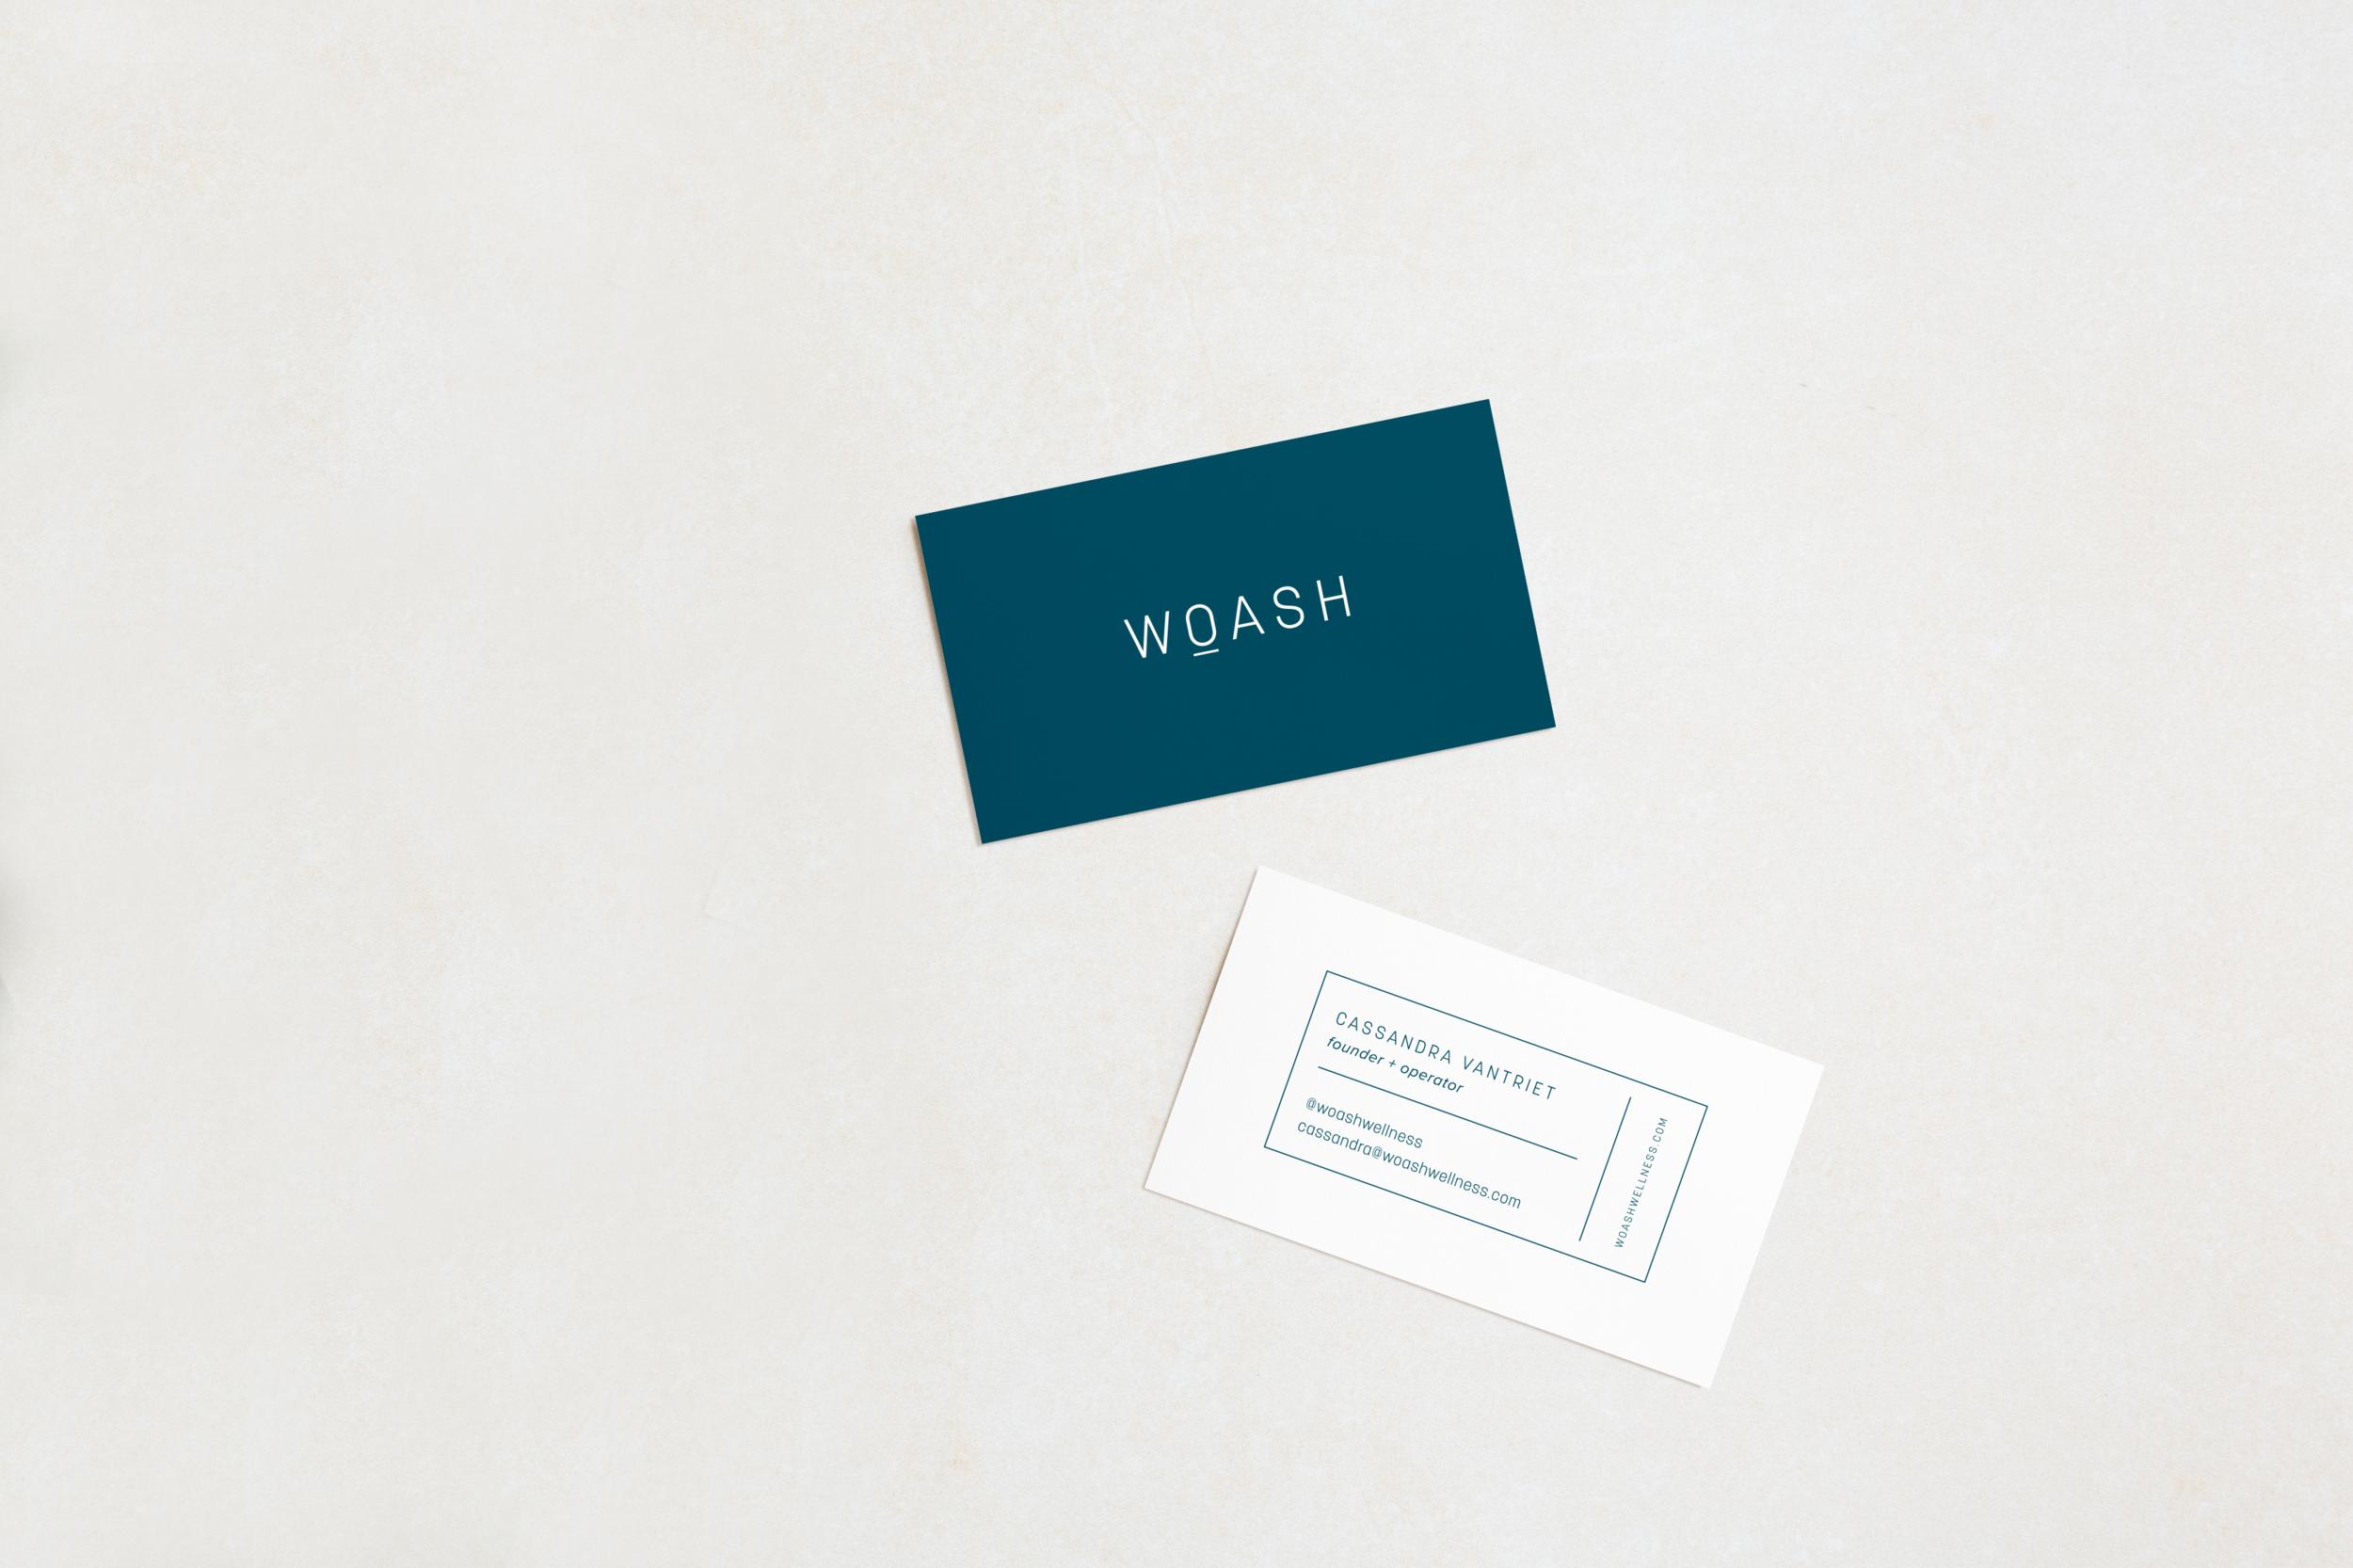 WOASH Wellness Business Cards designed by Salt Design Co.